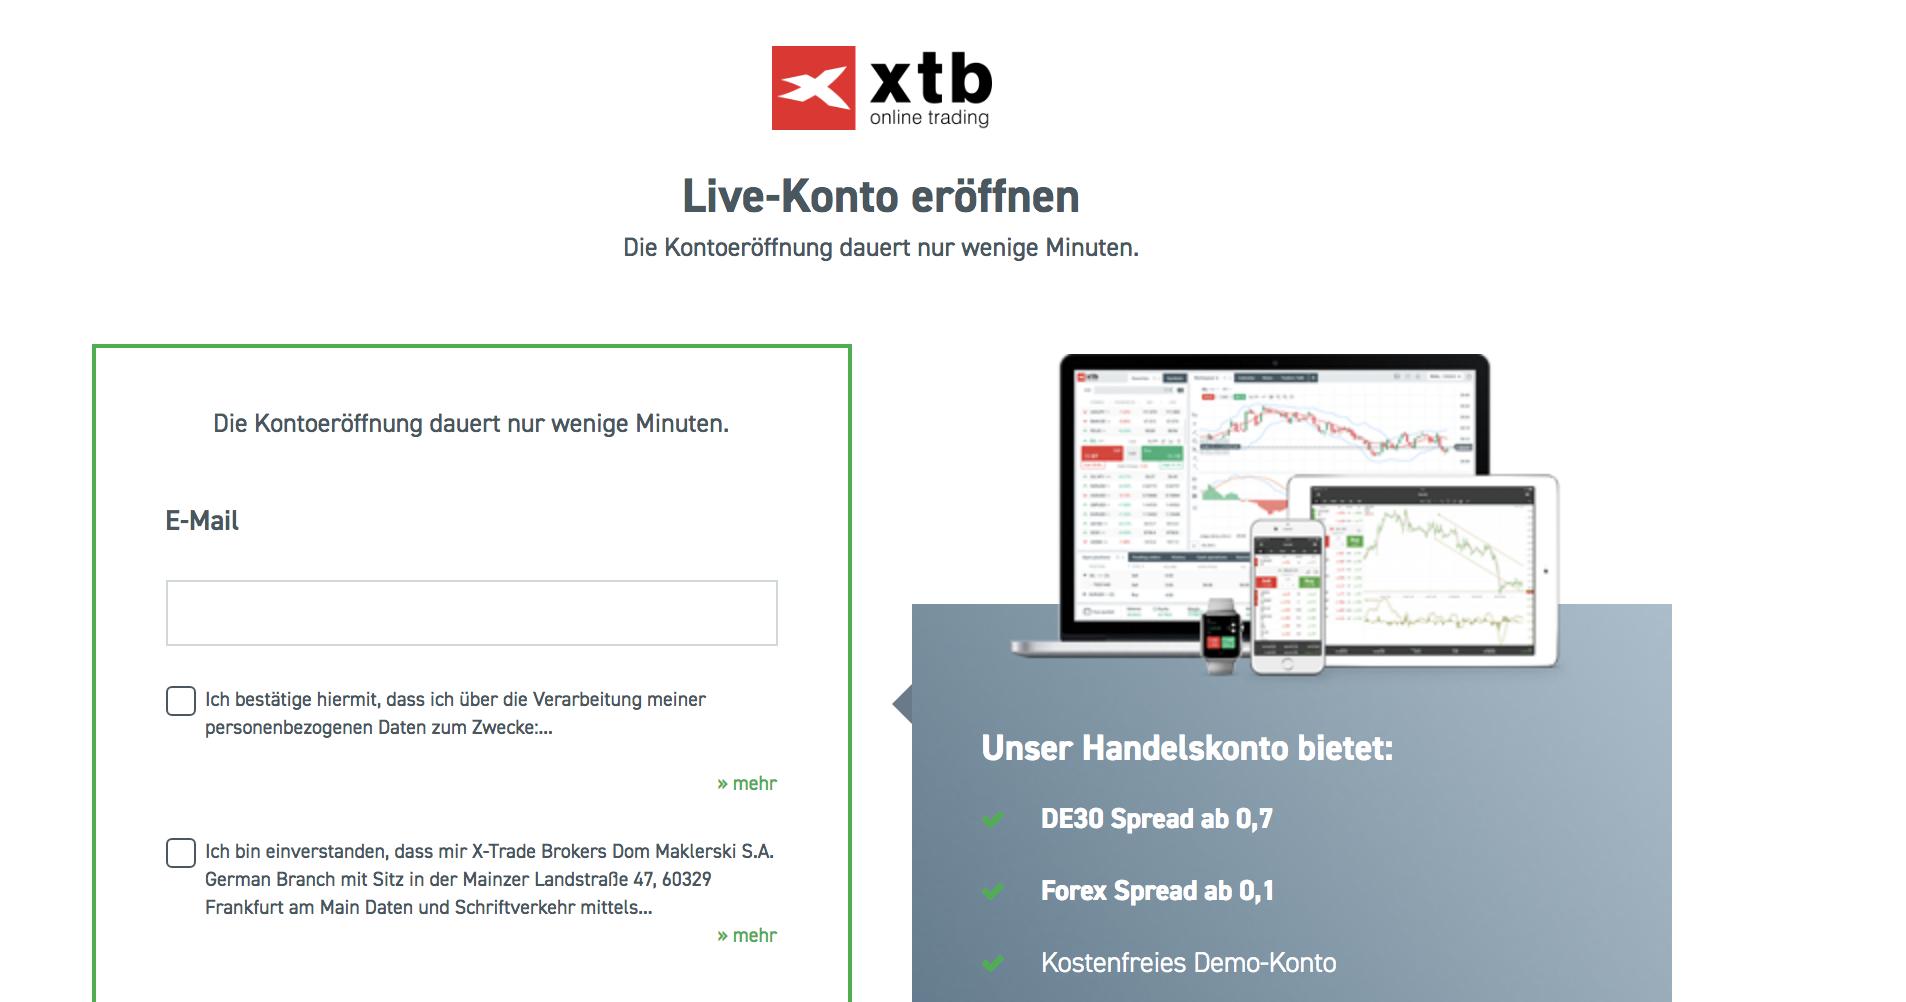 XTB Live-Konto